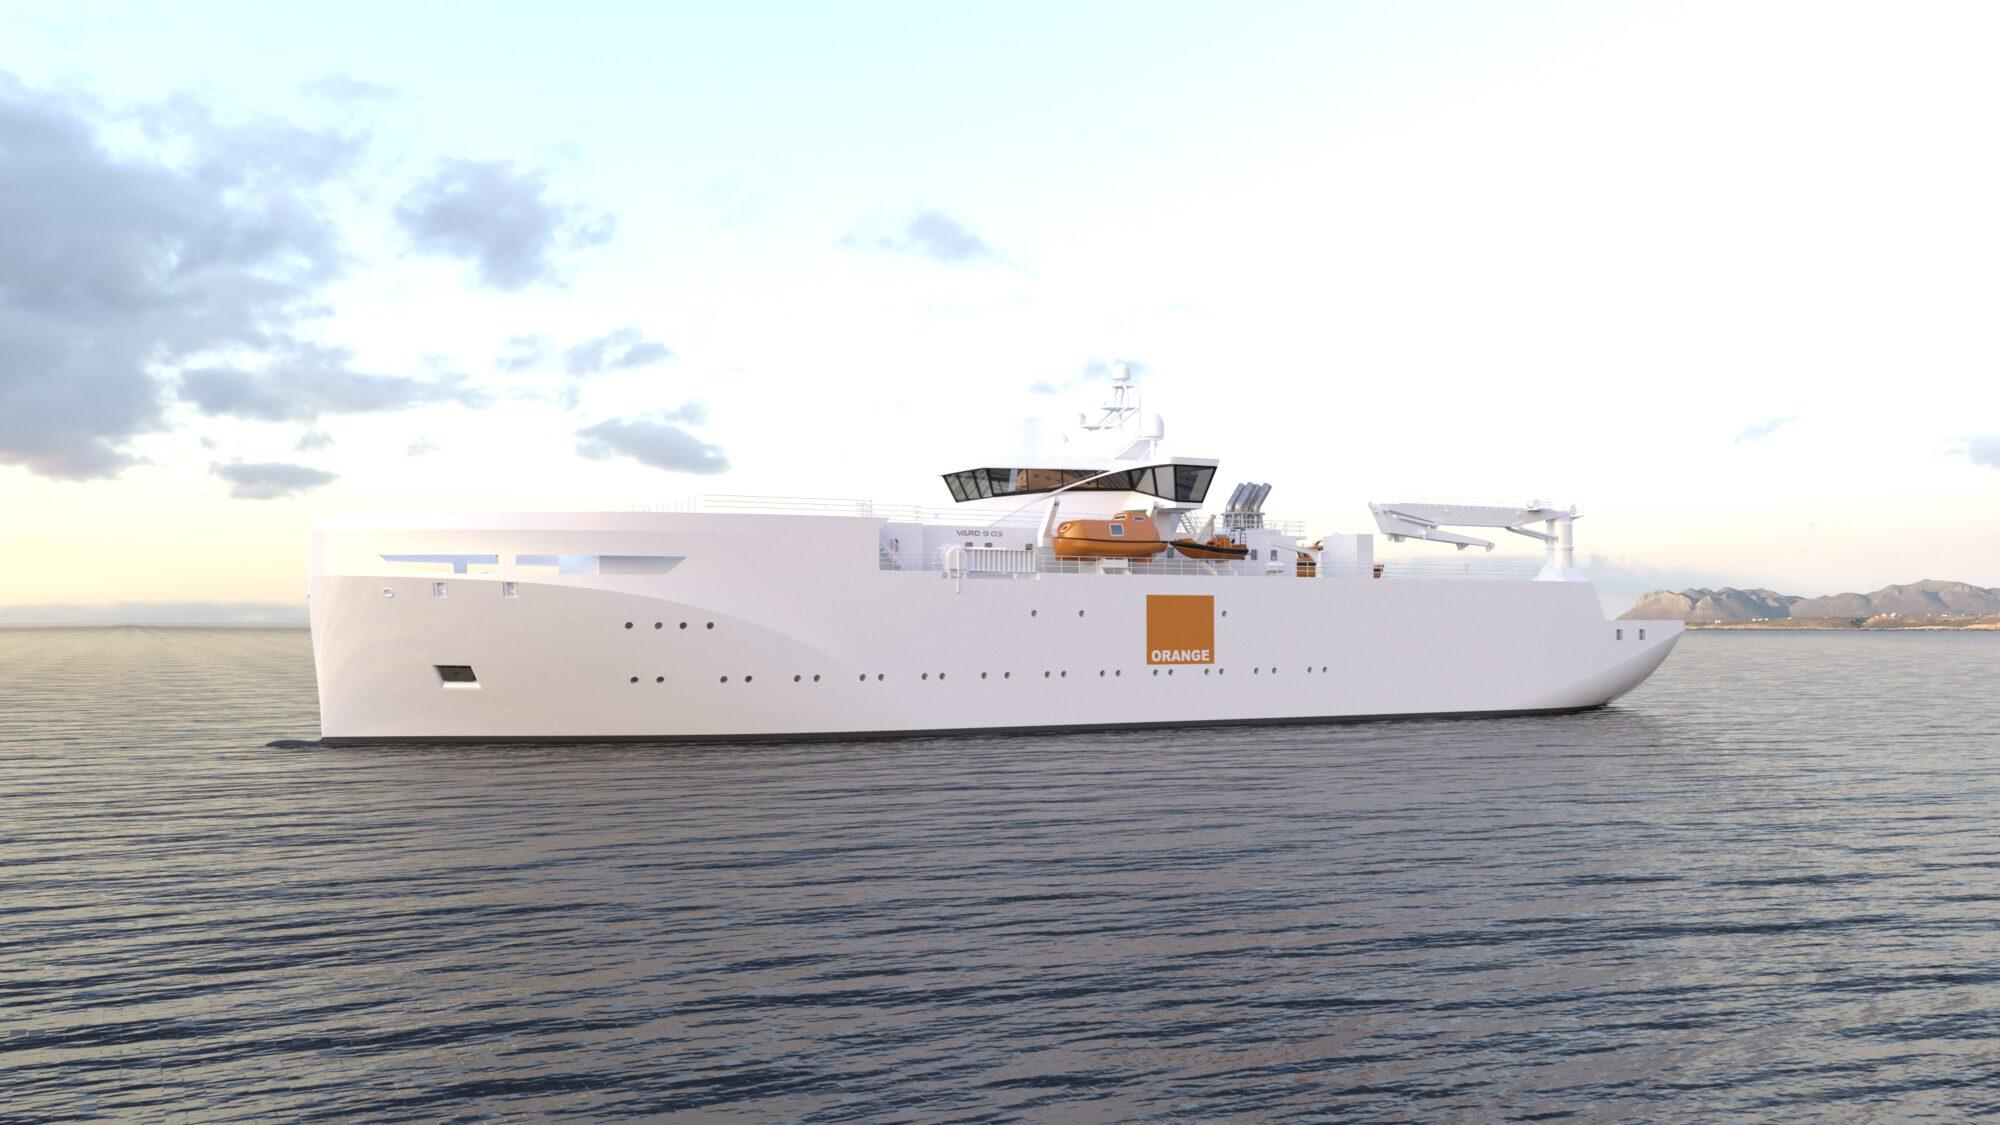 Fincantieri,Vard將如何處理法國Orange公司的海底電纜